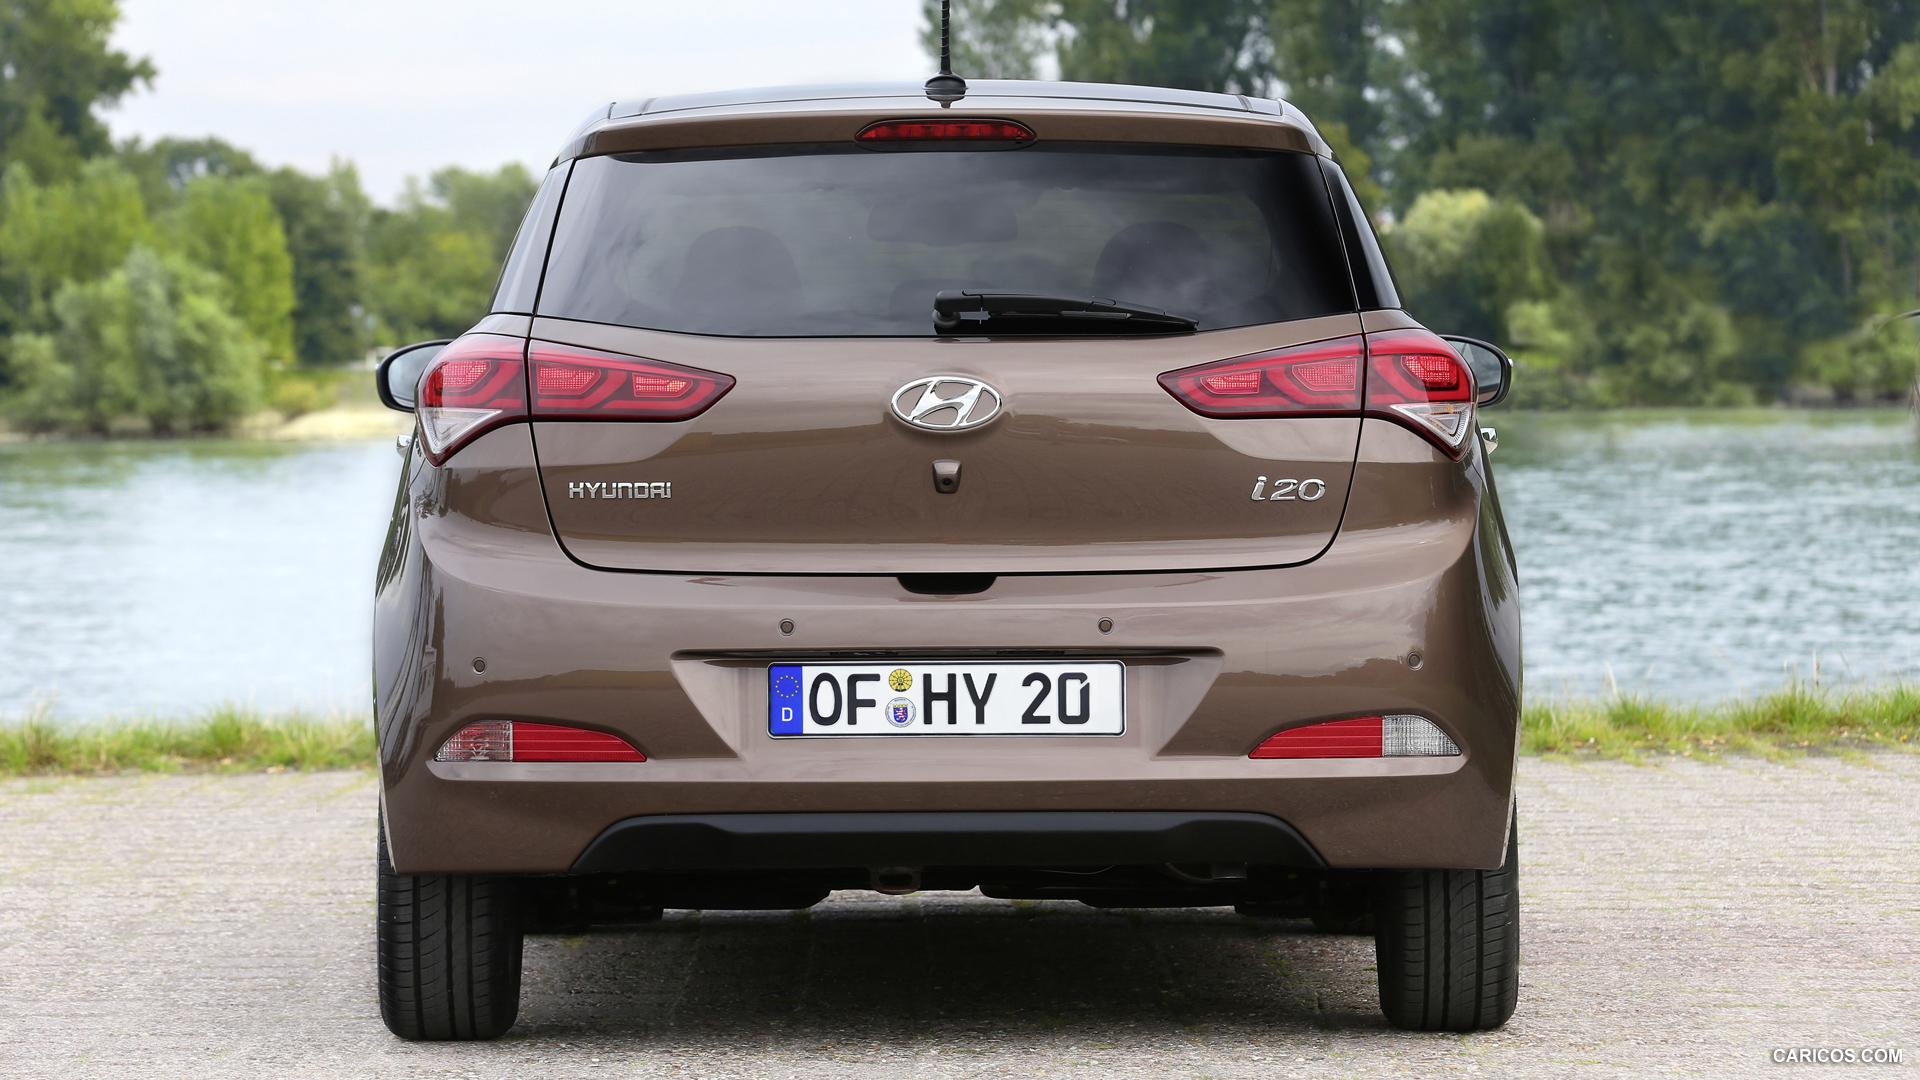 2015 Hyundai i20   Rear HD Wallpaper 12 1920x1080